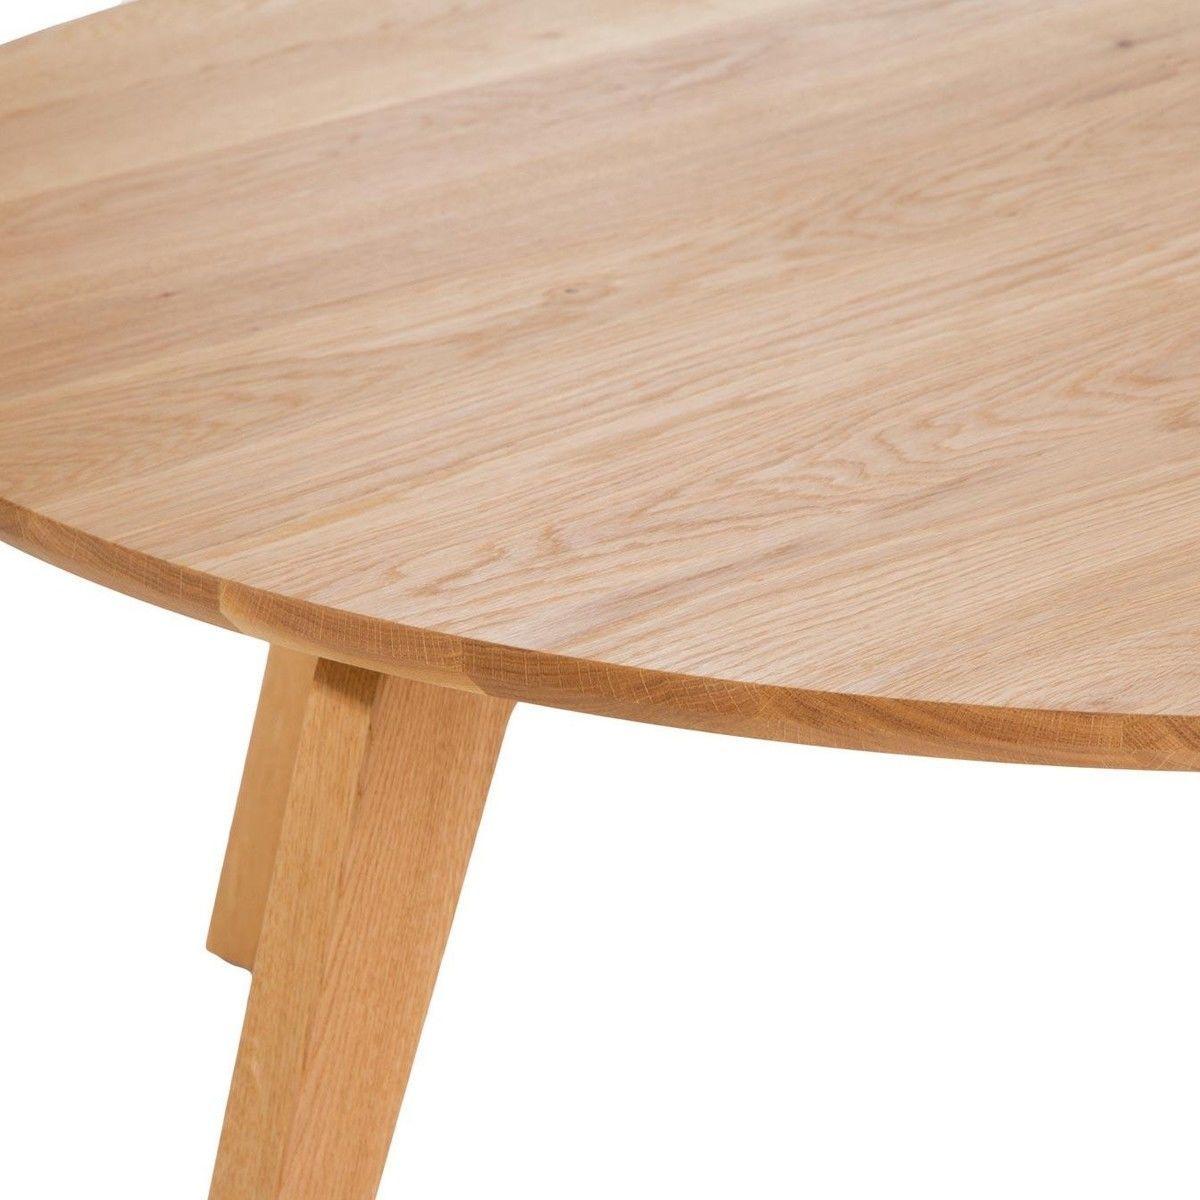 dweller solid wood side table  jan kurtz  ambientedirectcom - jan kurtz  dweller solid wood side table